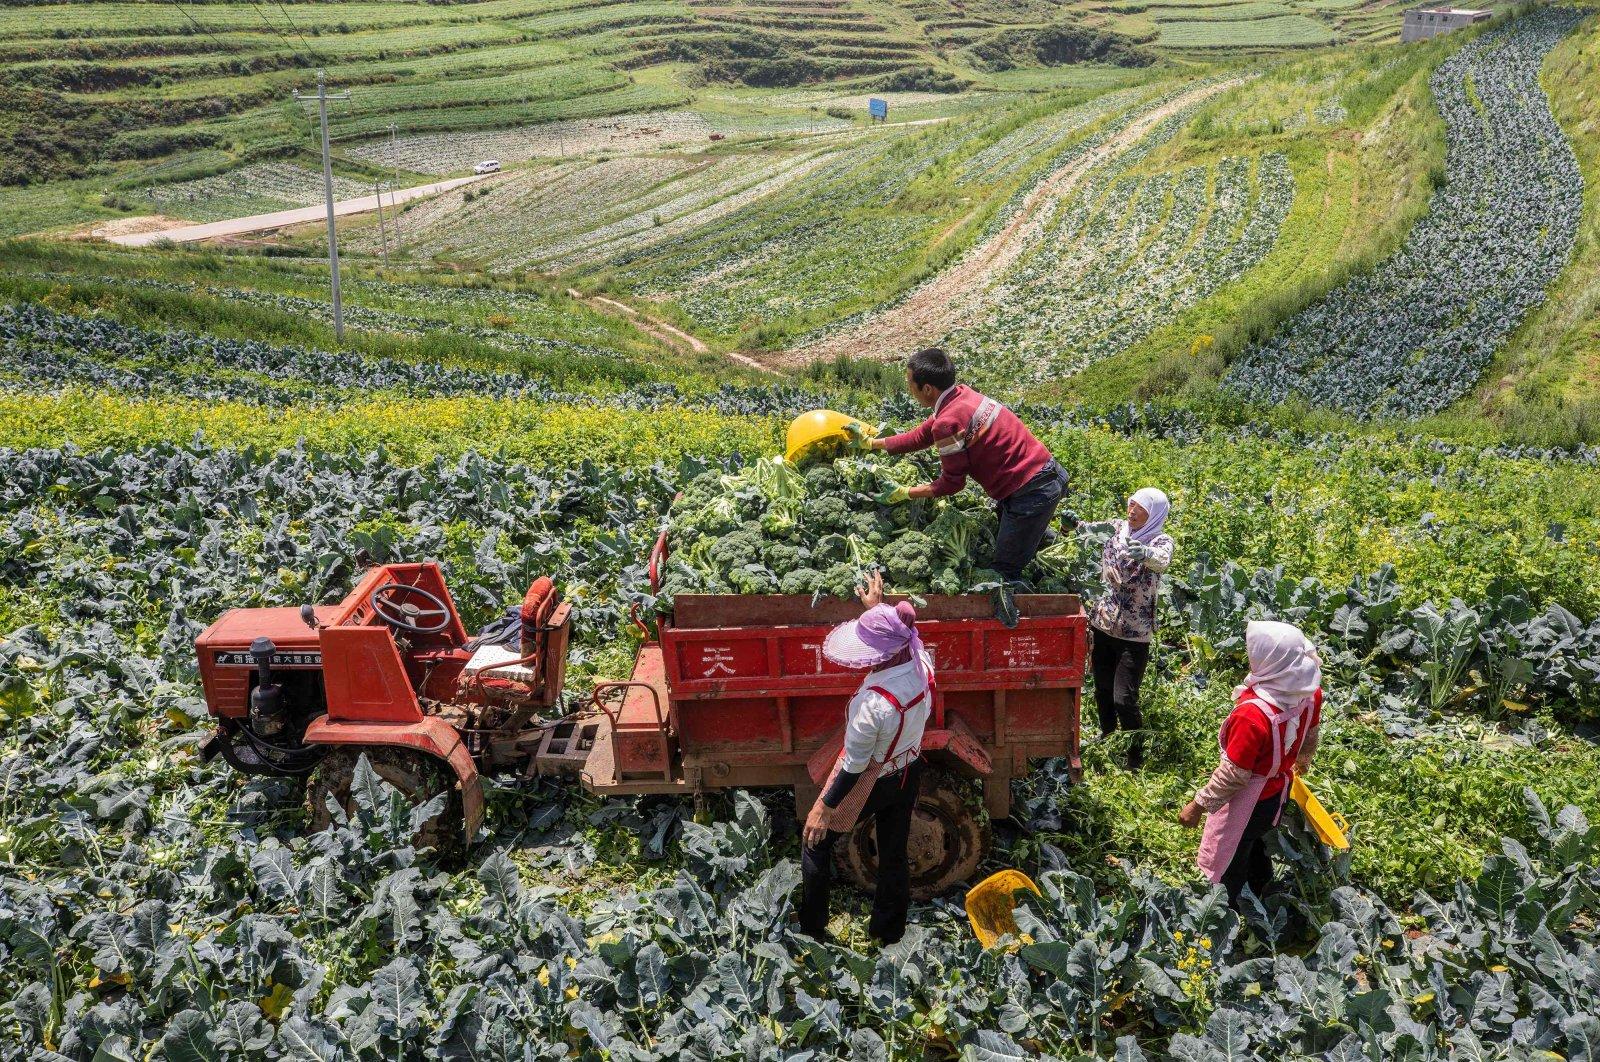 Farmers harvest broccoli in a field in Bijie in China's southwestern Guizhou province, July 8, 2021. (AFP Photo)